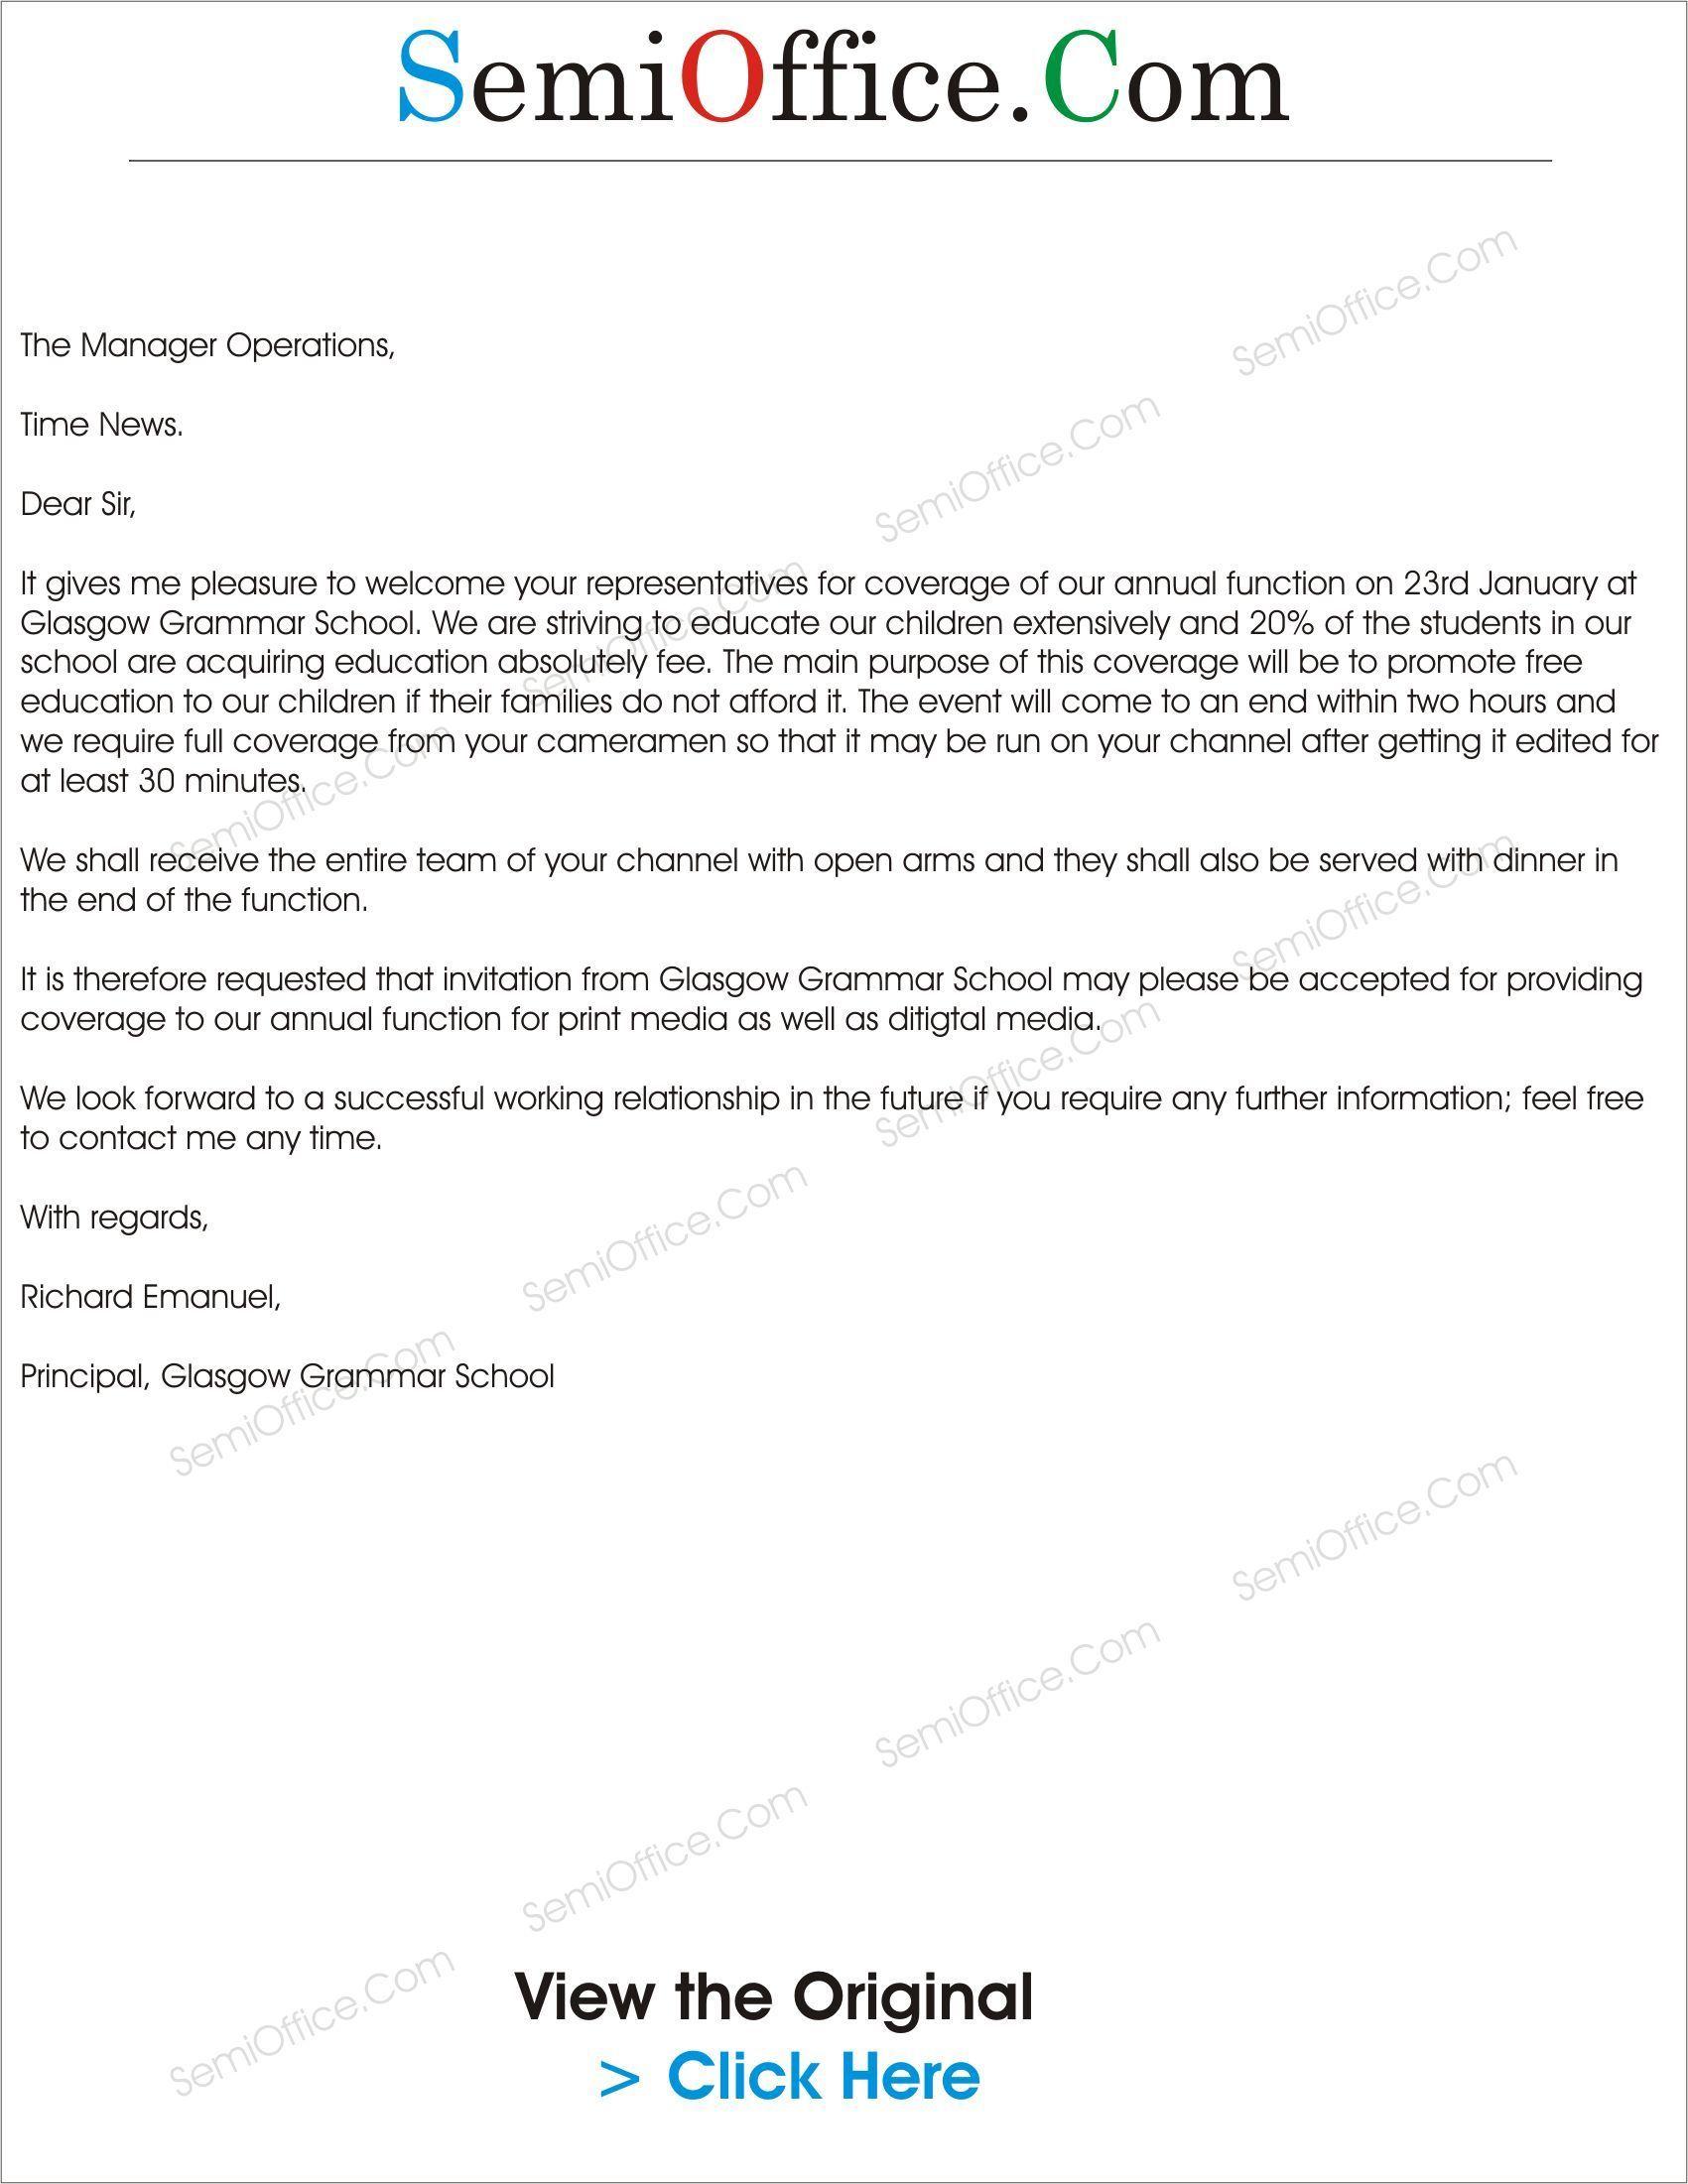 Contoh Formal Invitation Letter Graduation Ceremony – Cara Golden